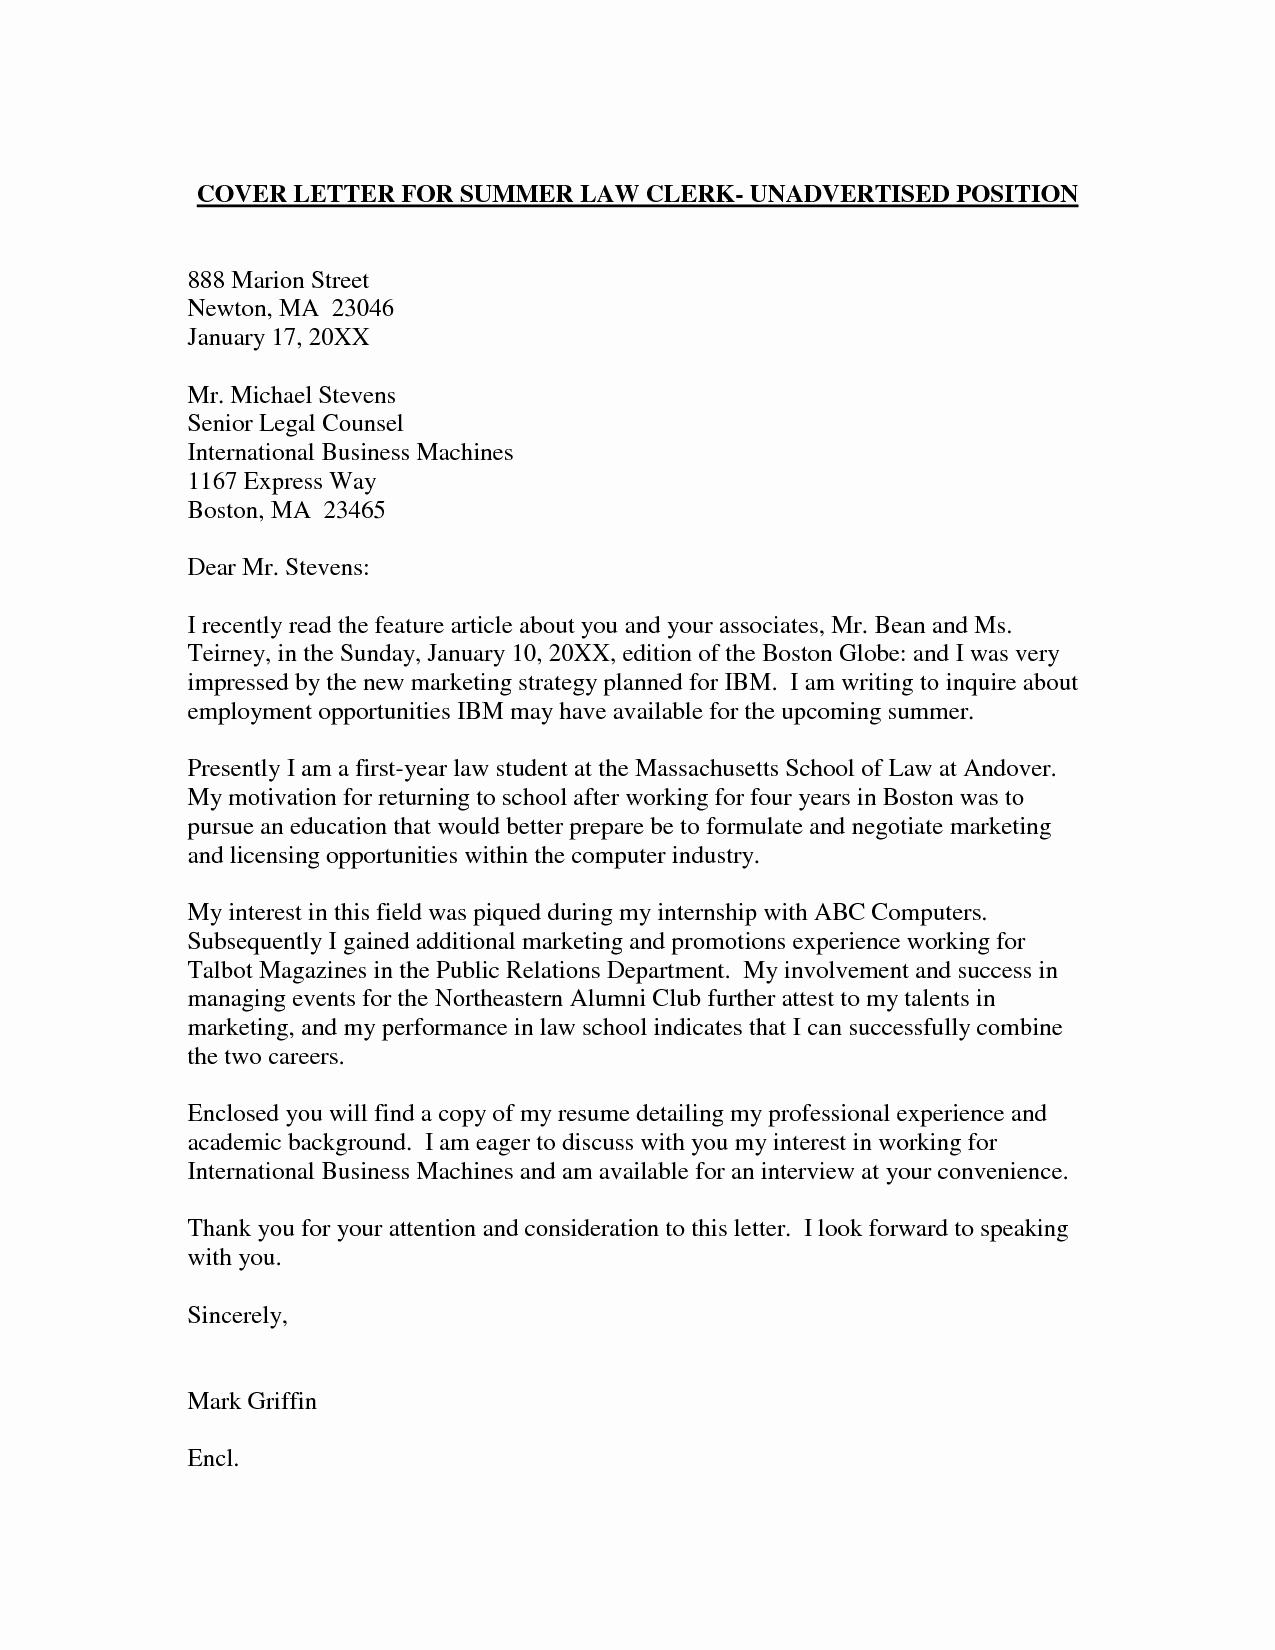 Cover Letter for Staffing Agency Fresh Employment Cover Letter Template Wondercover Letter